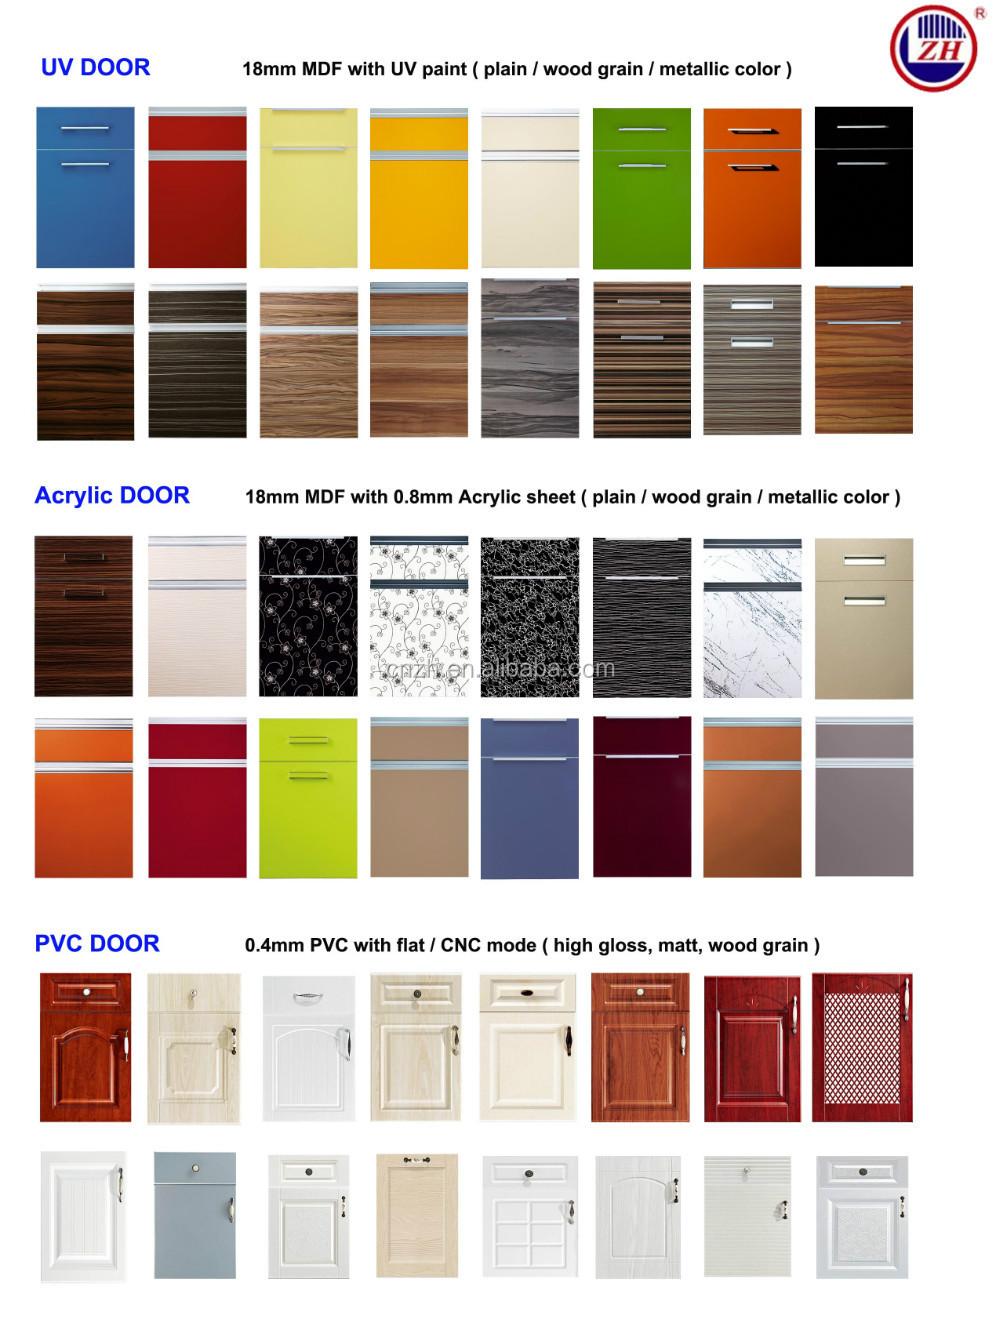 European style slab white gloss laminated mdf kitchen cabinet doors mdf kitchen cabinet doors European style slab white gloss laminated mdf kitchen cabinet doors